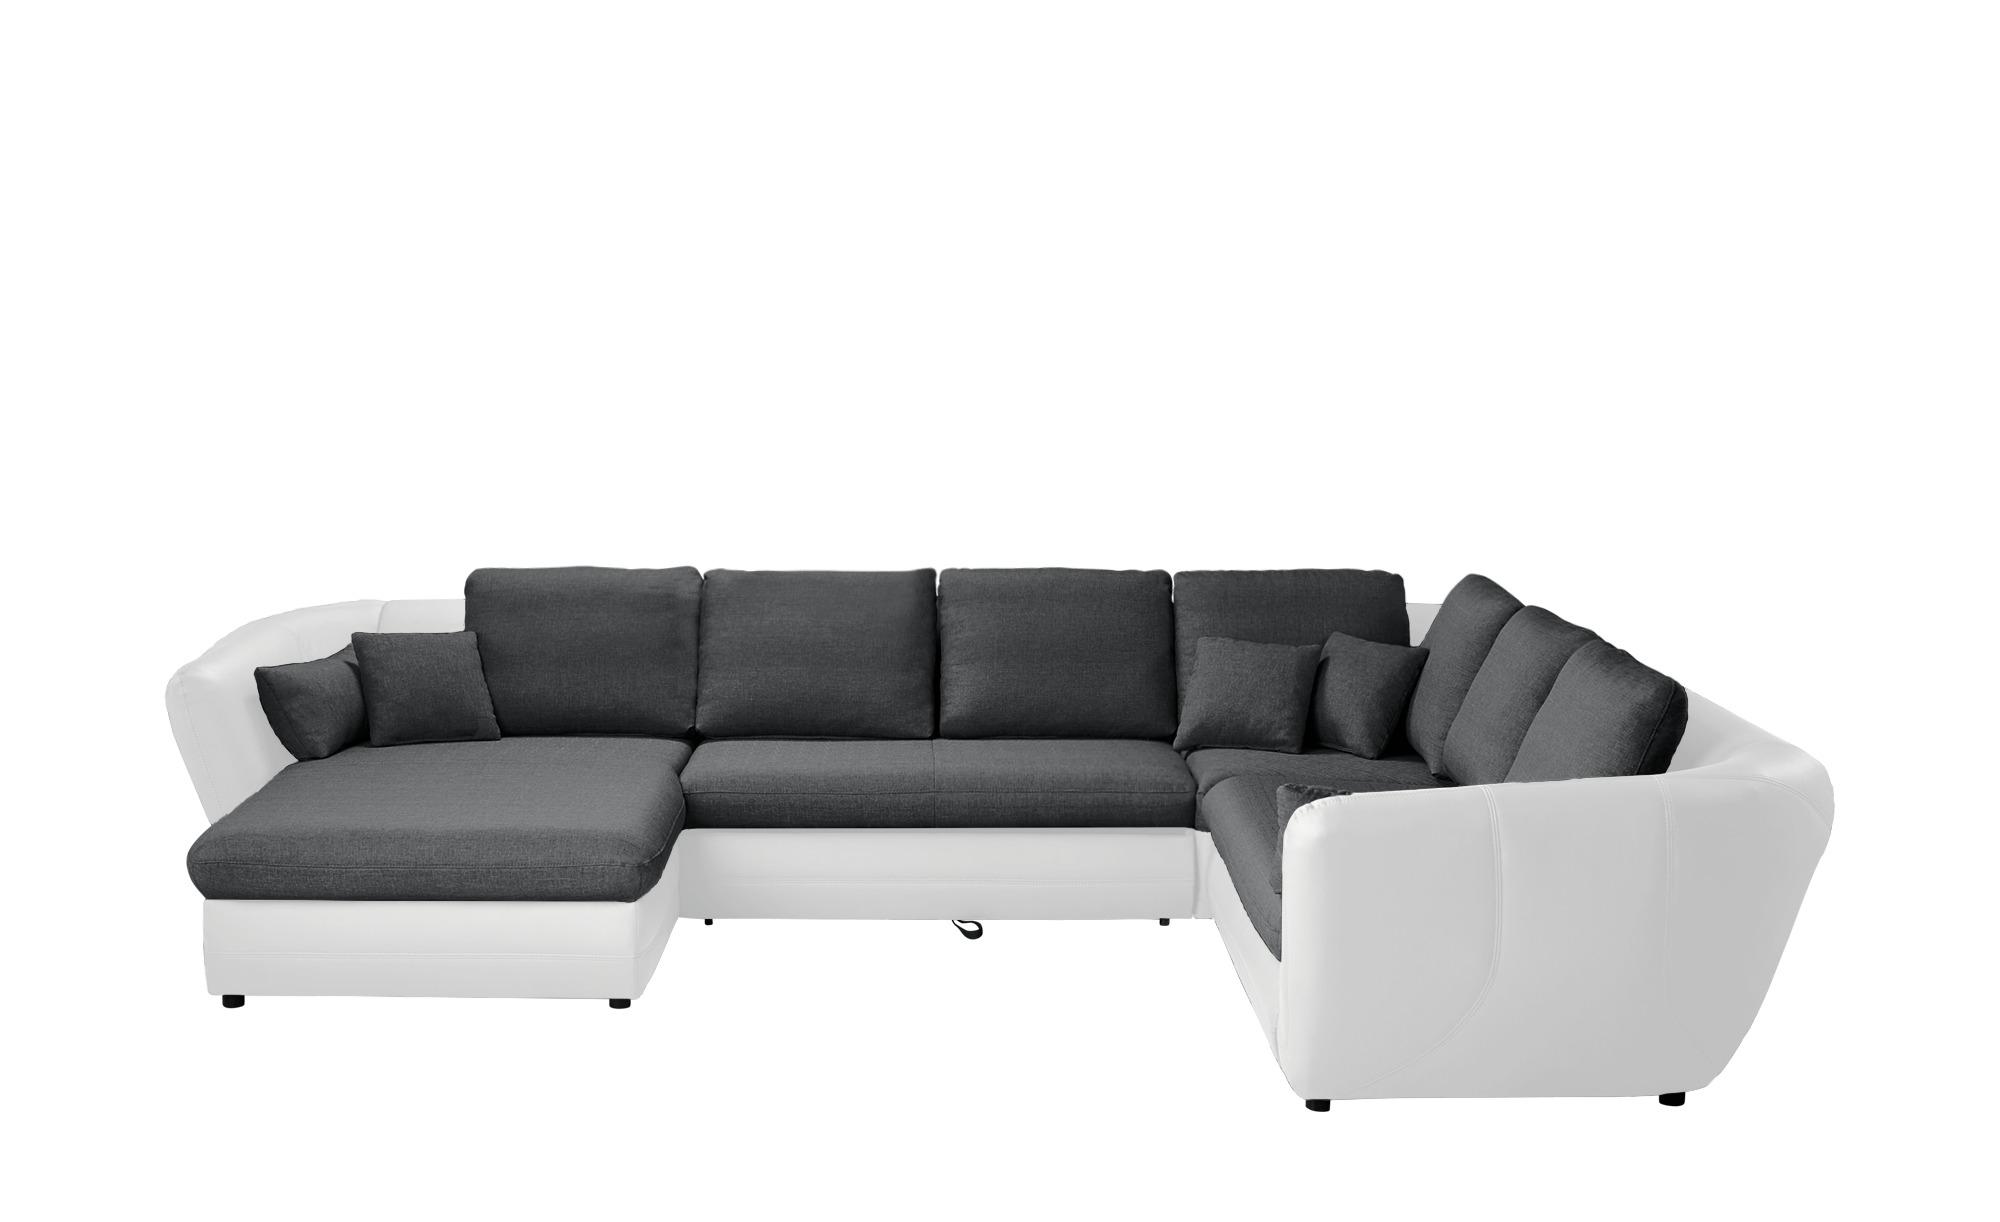 Smart Wohnlandschaft Weiss Grau Kunstleder Flachgewebe Verona Big Sofa Kaufen Sofa Design Sofa Leder